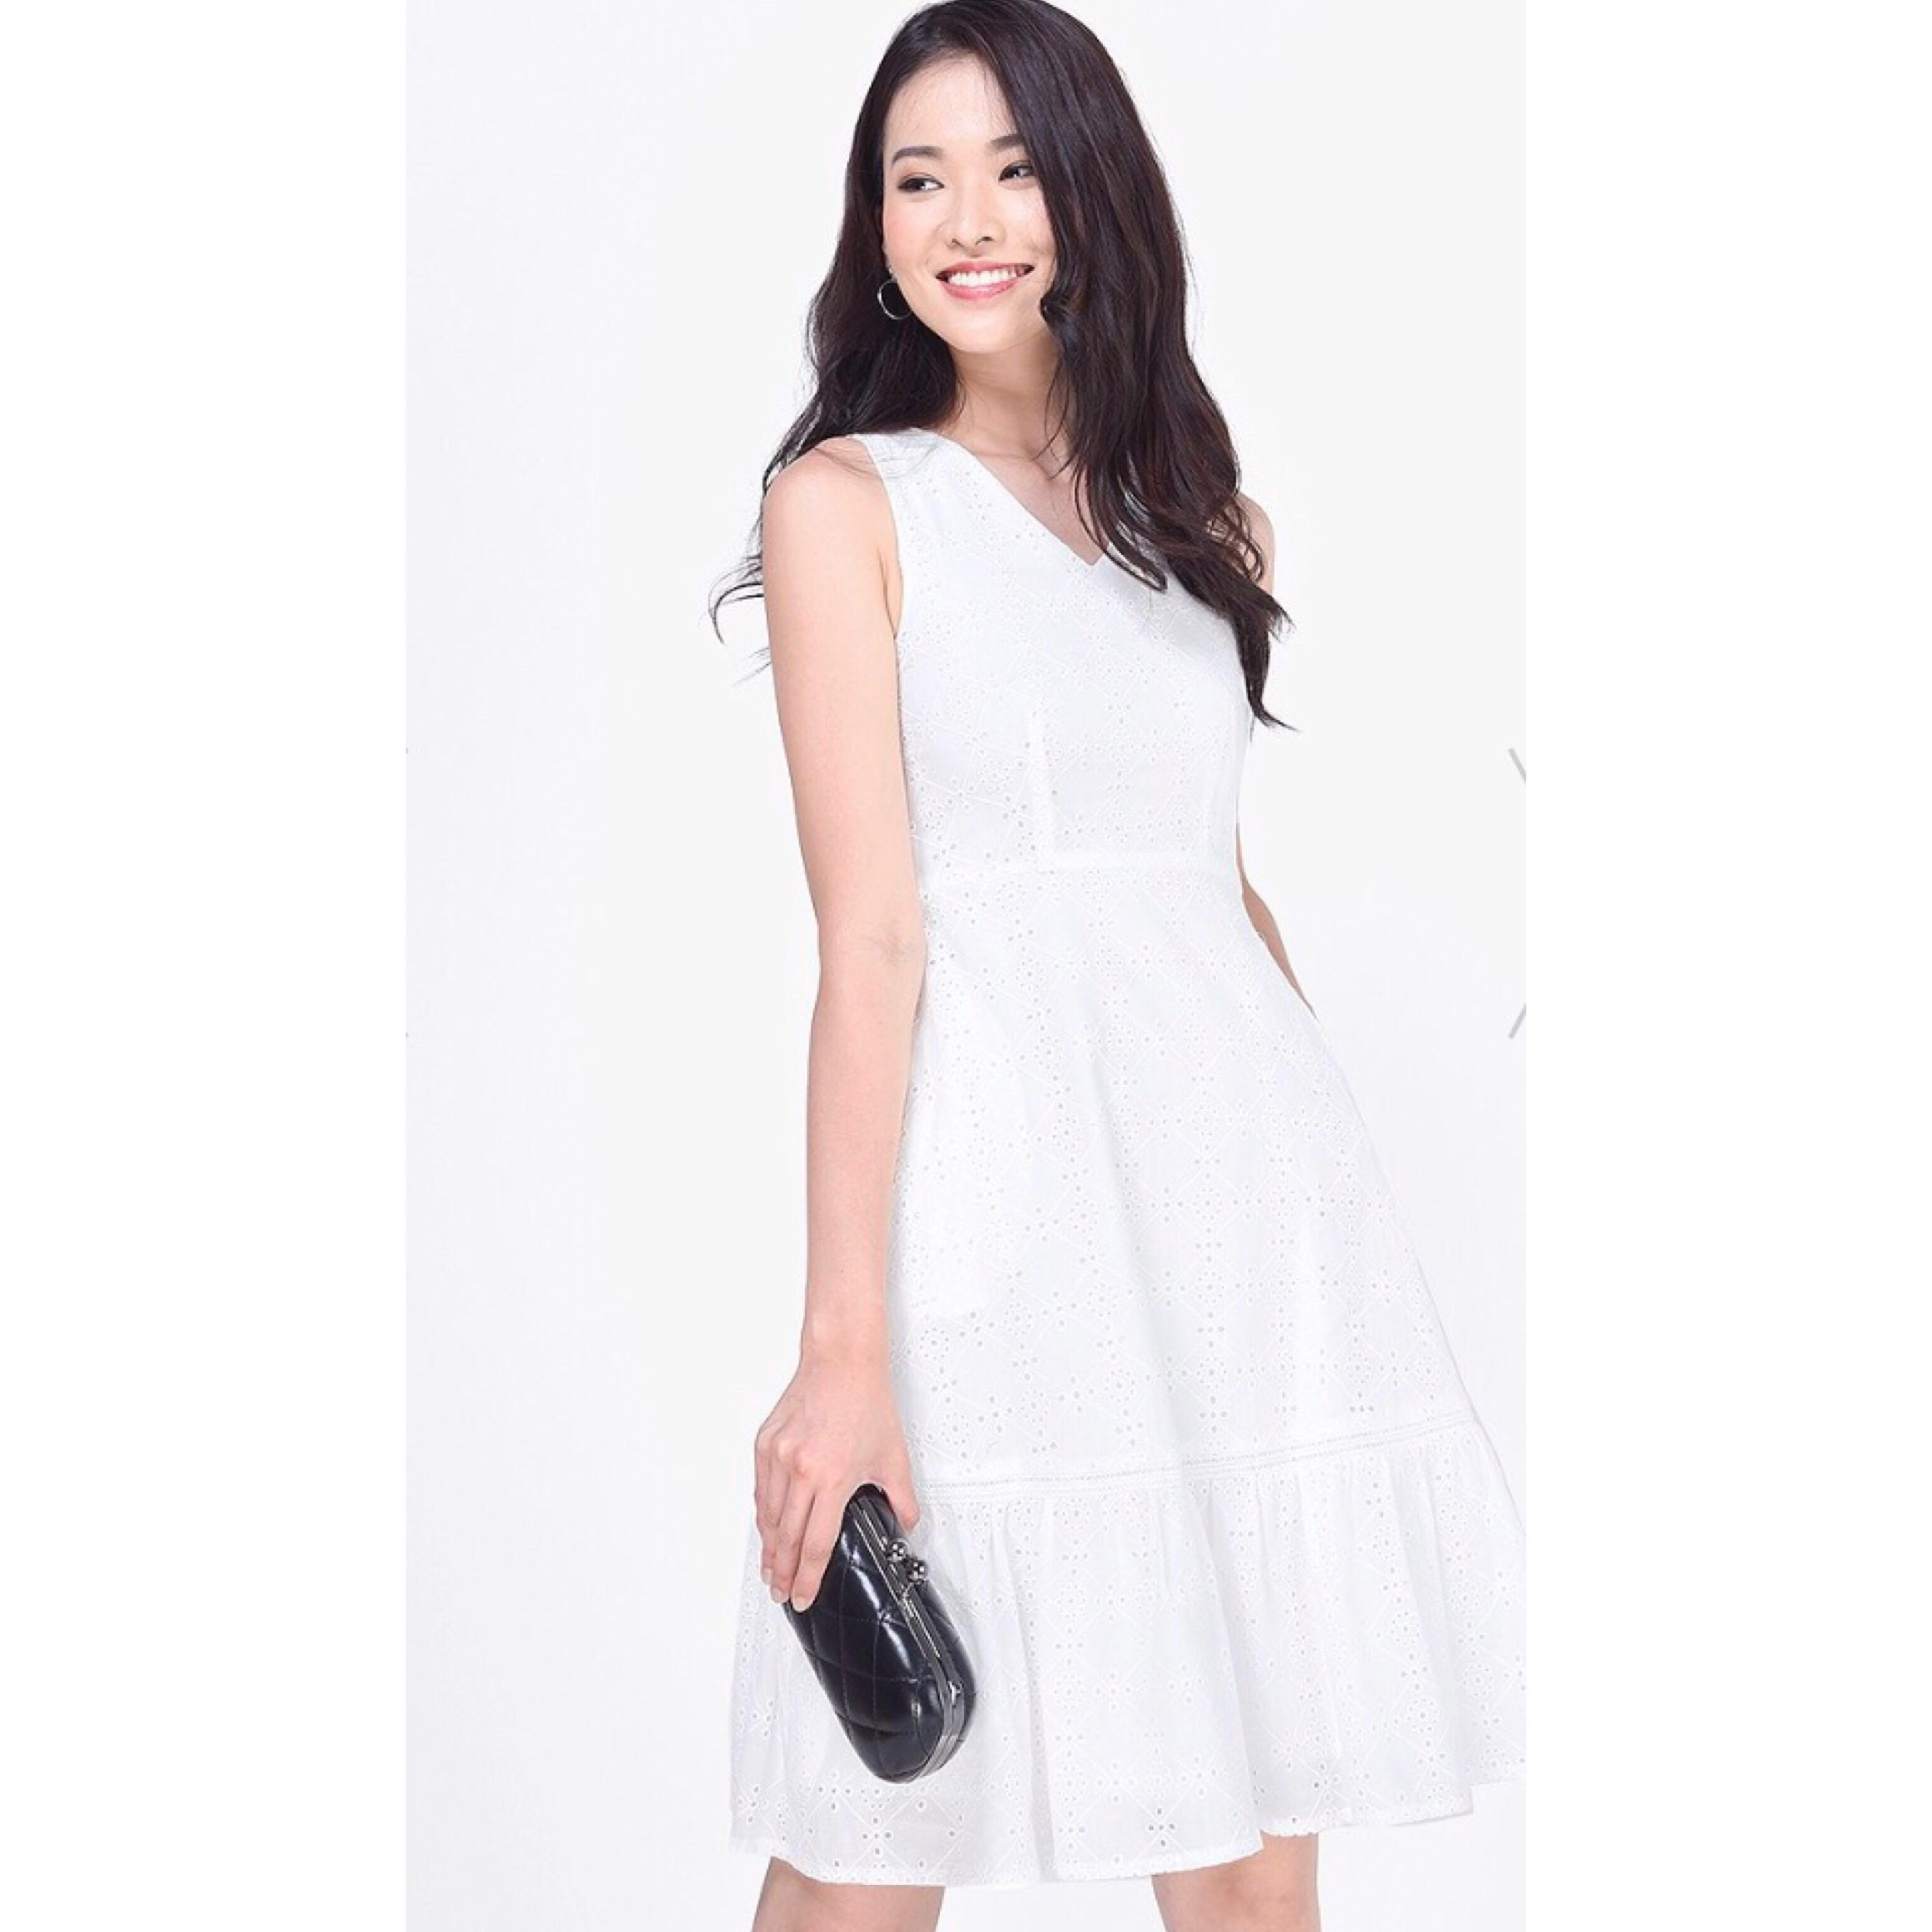 9a0e31cd3 Fayth Clarisse Eyelet Drop Hem Dress, Women's Fashion, Clothes ...